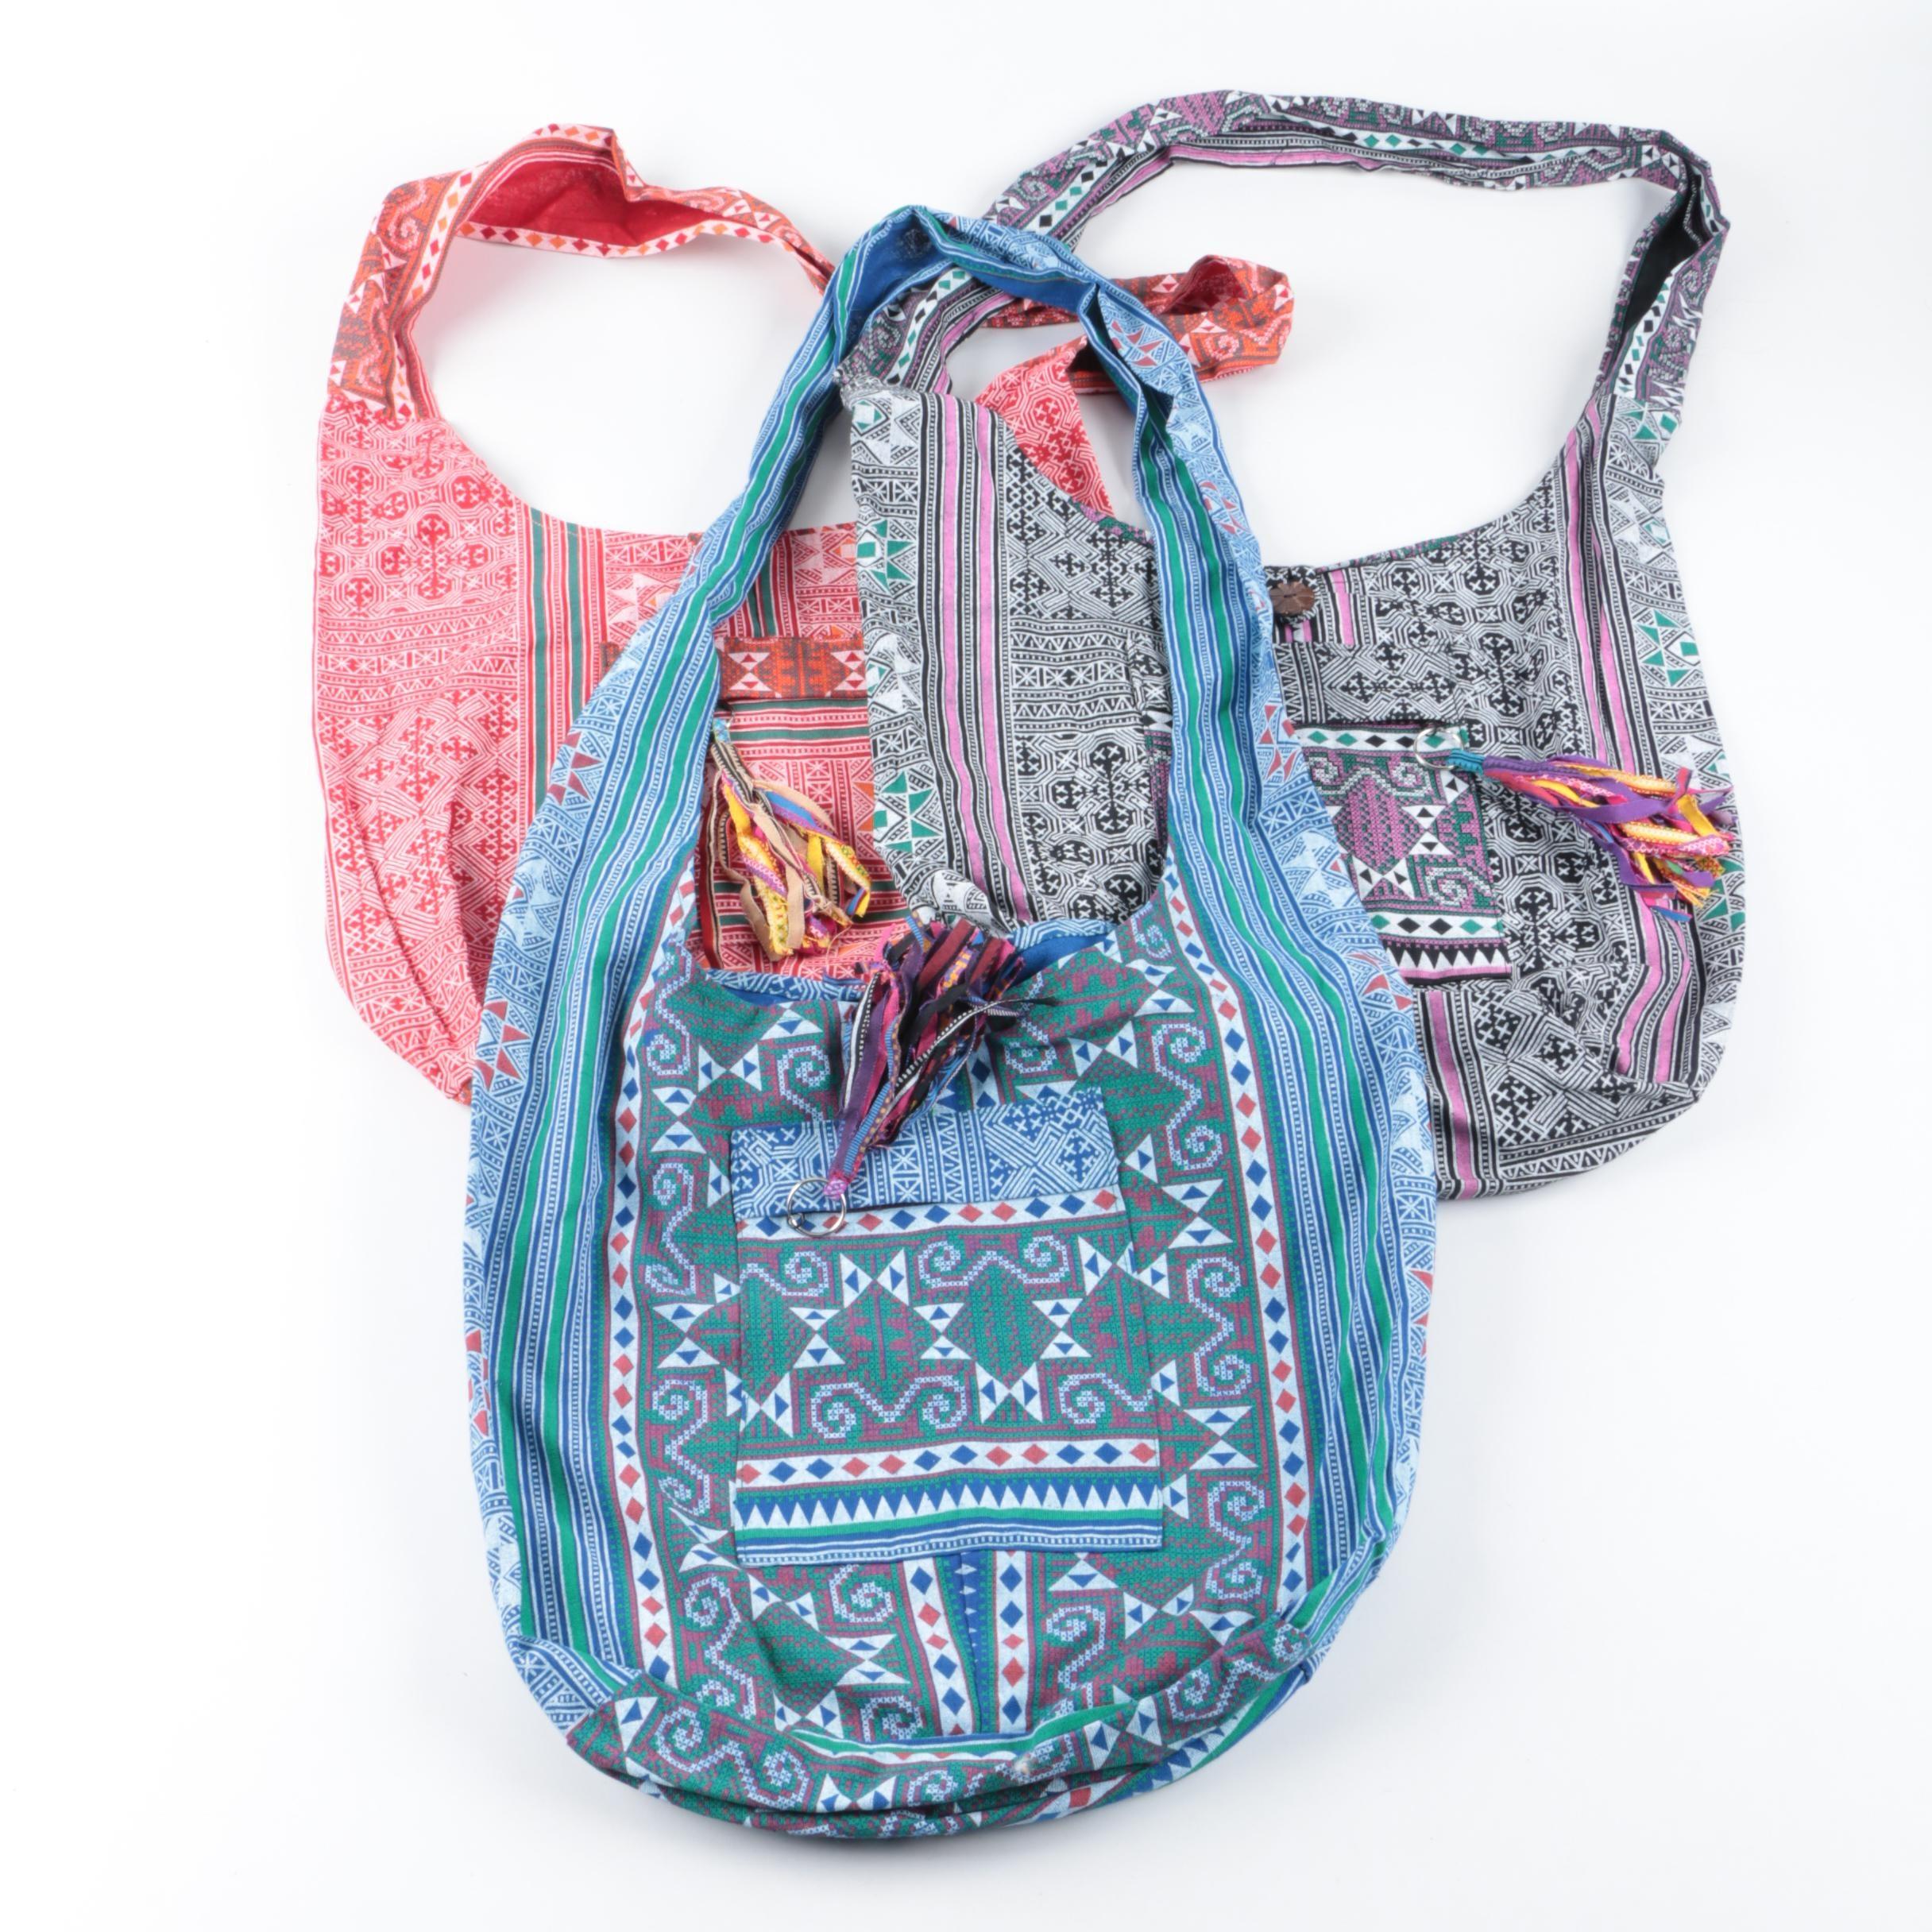 Printed Woven Canvas Crossbody Handbags